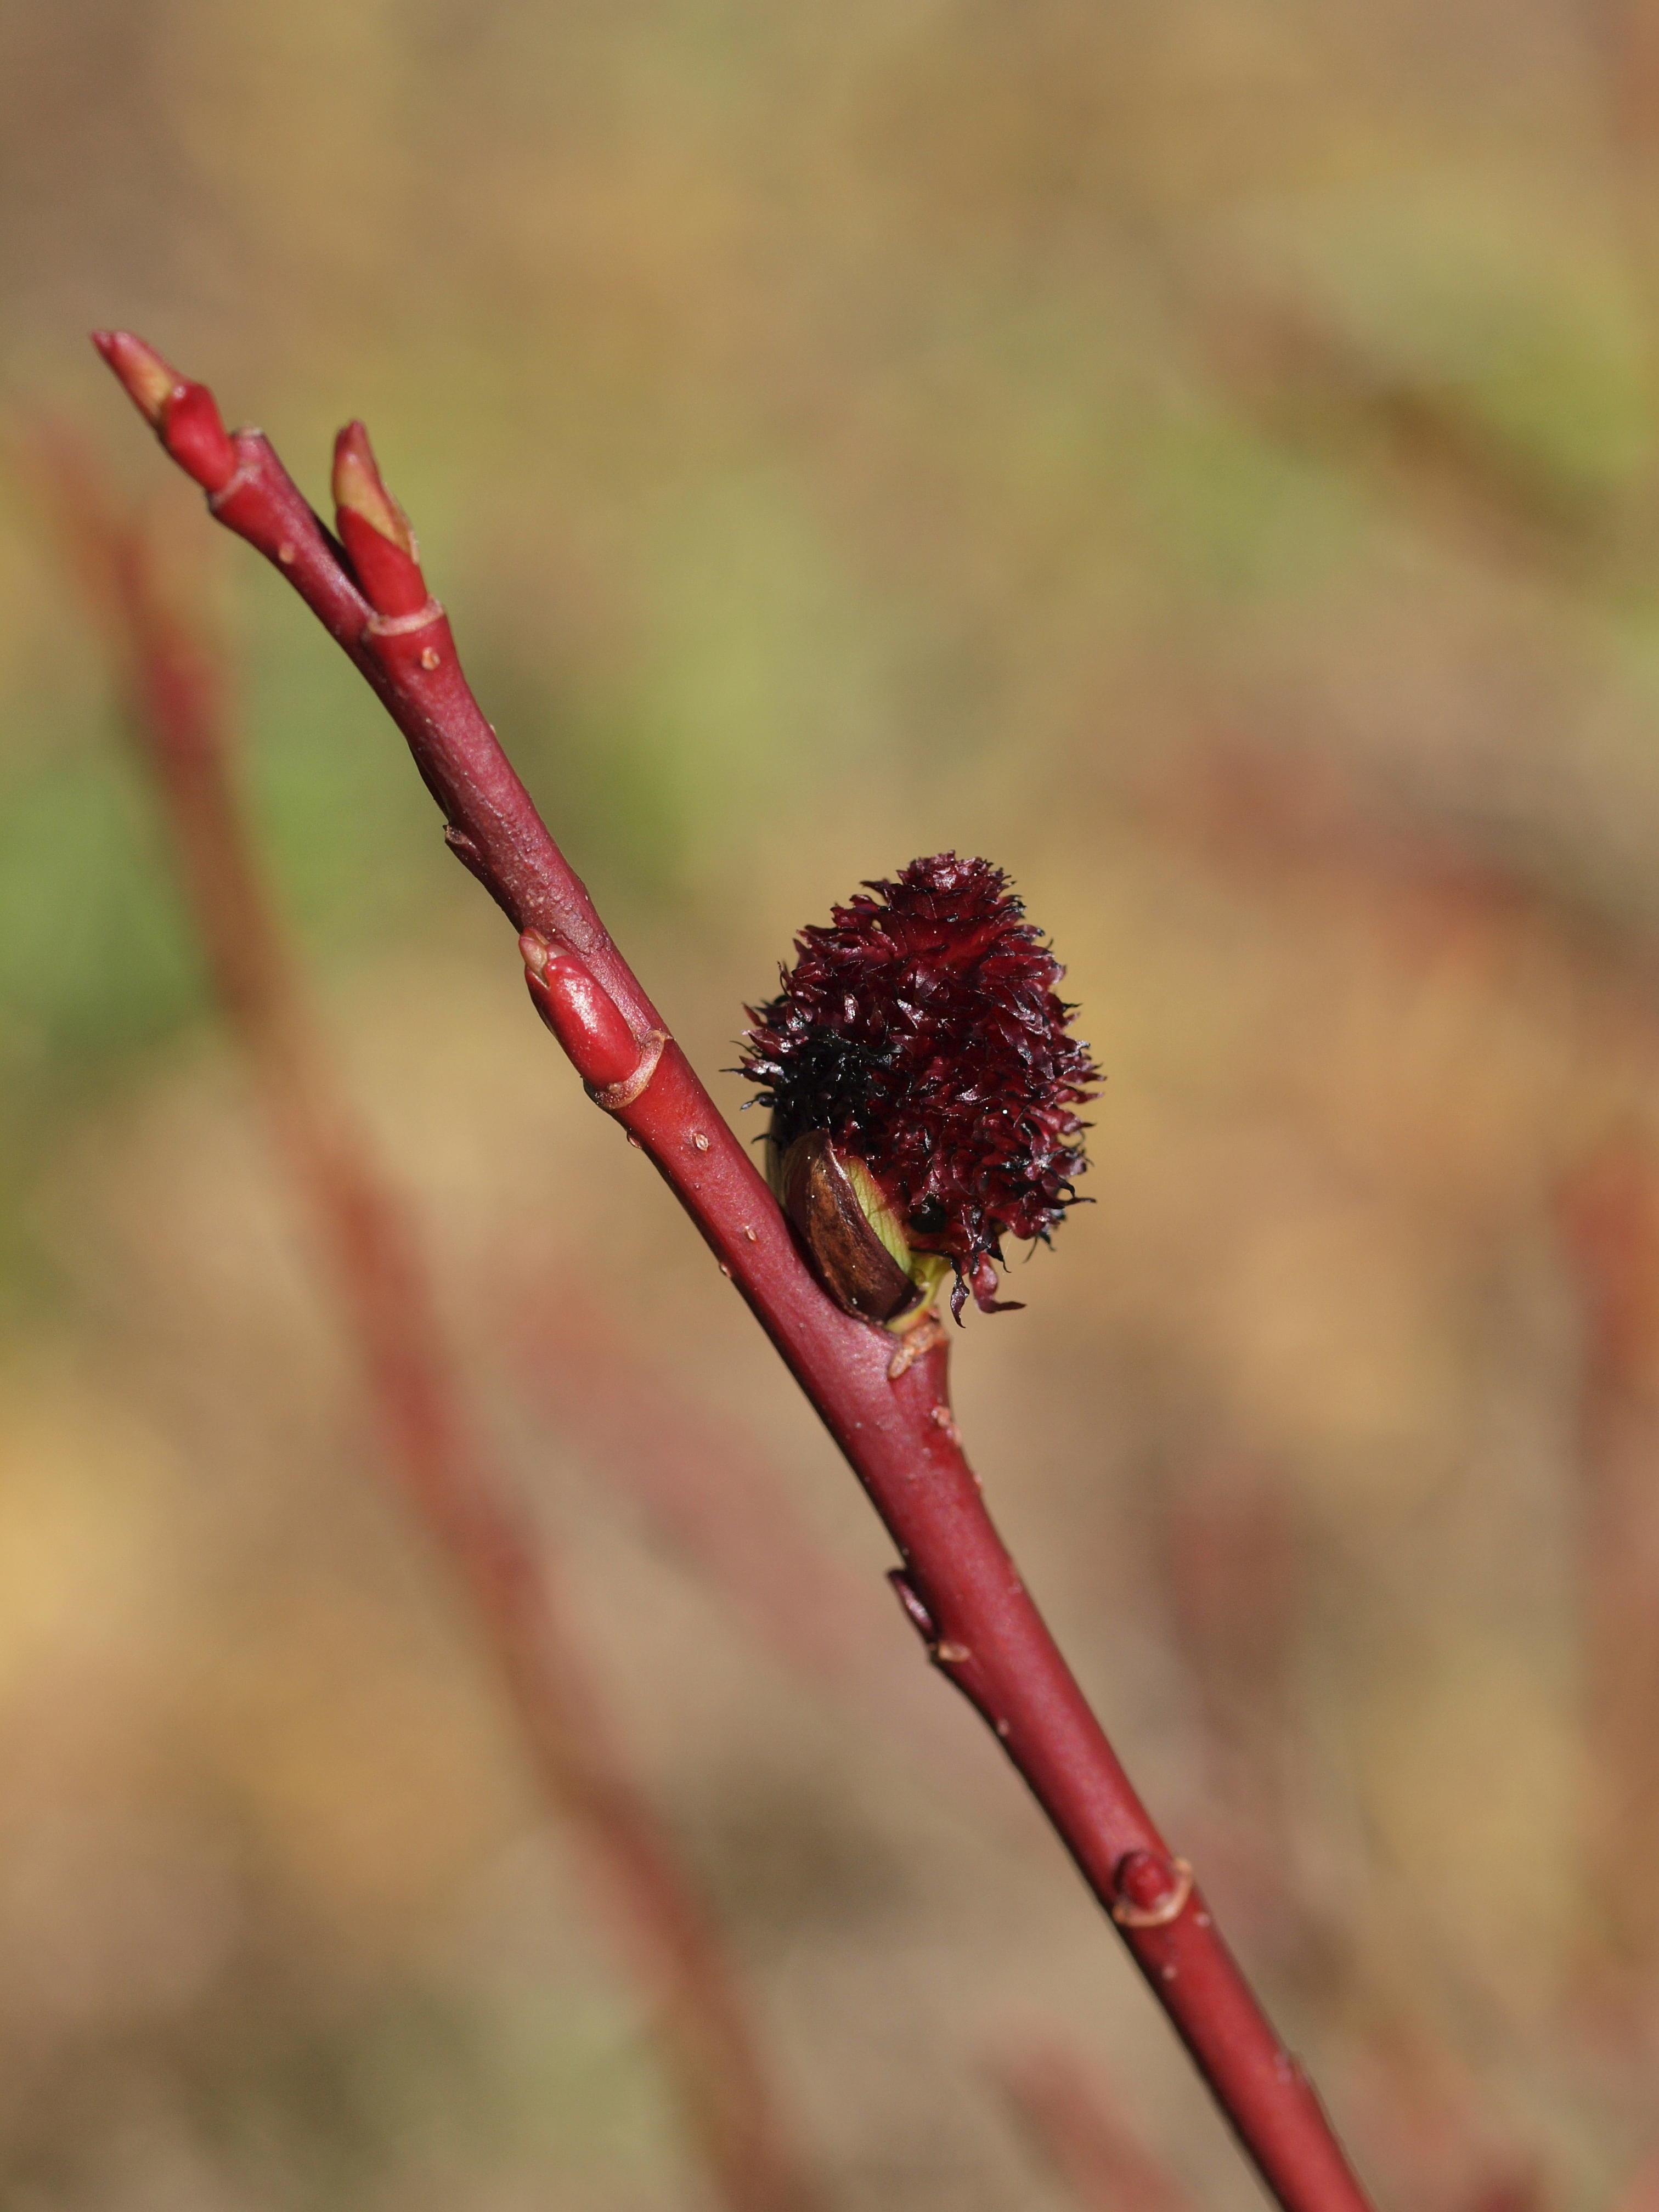 This should be Salix-melanostachys-1.jpeg.  Is it missing?